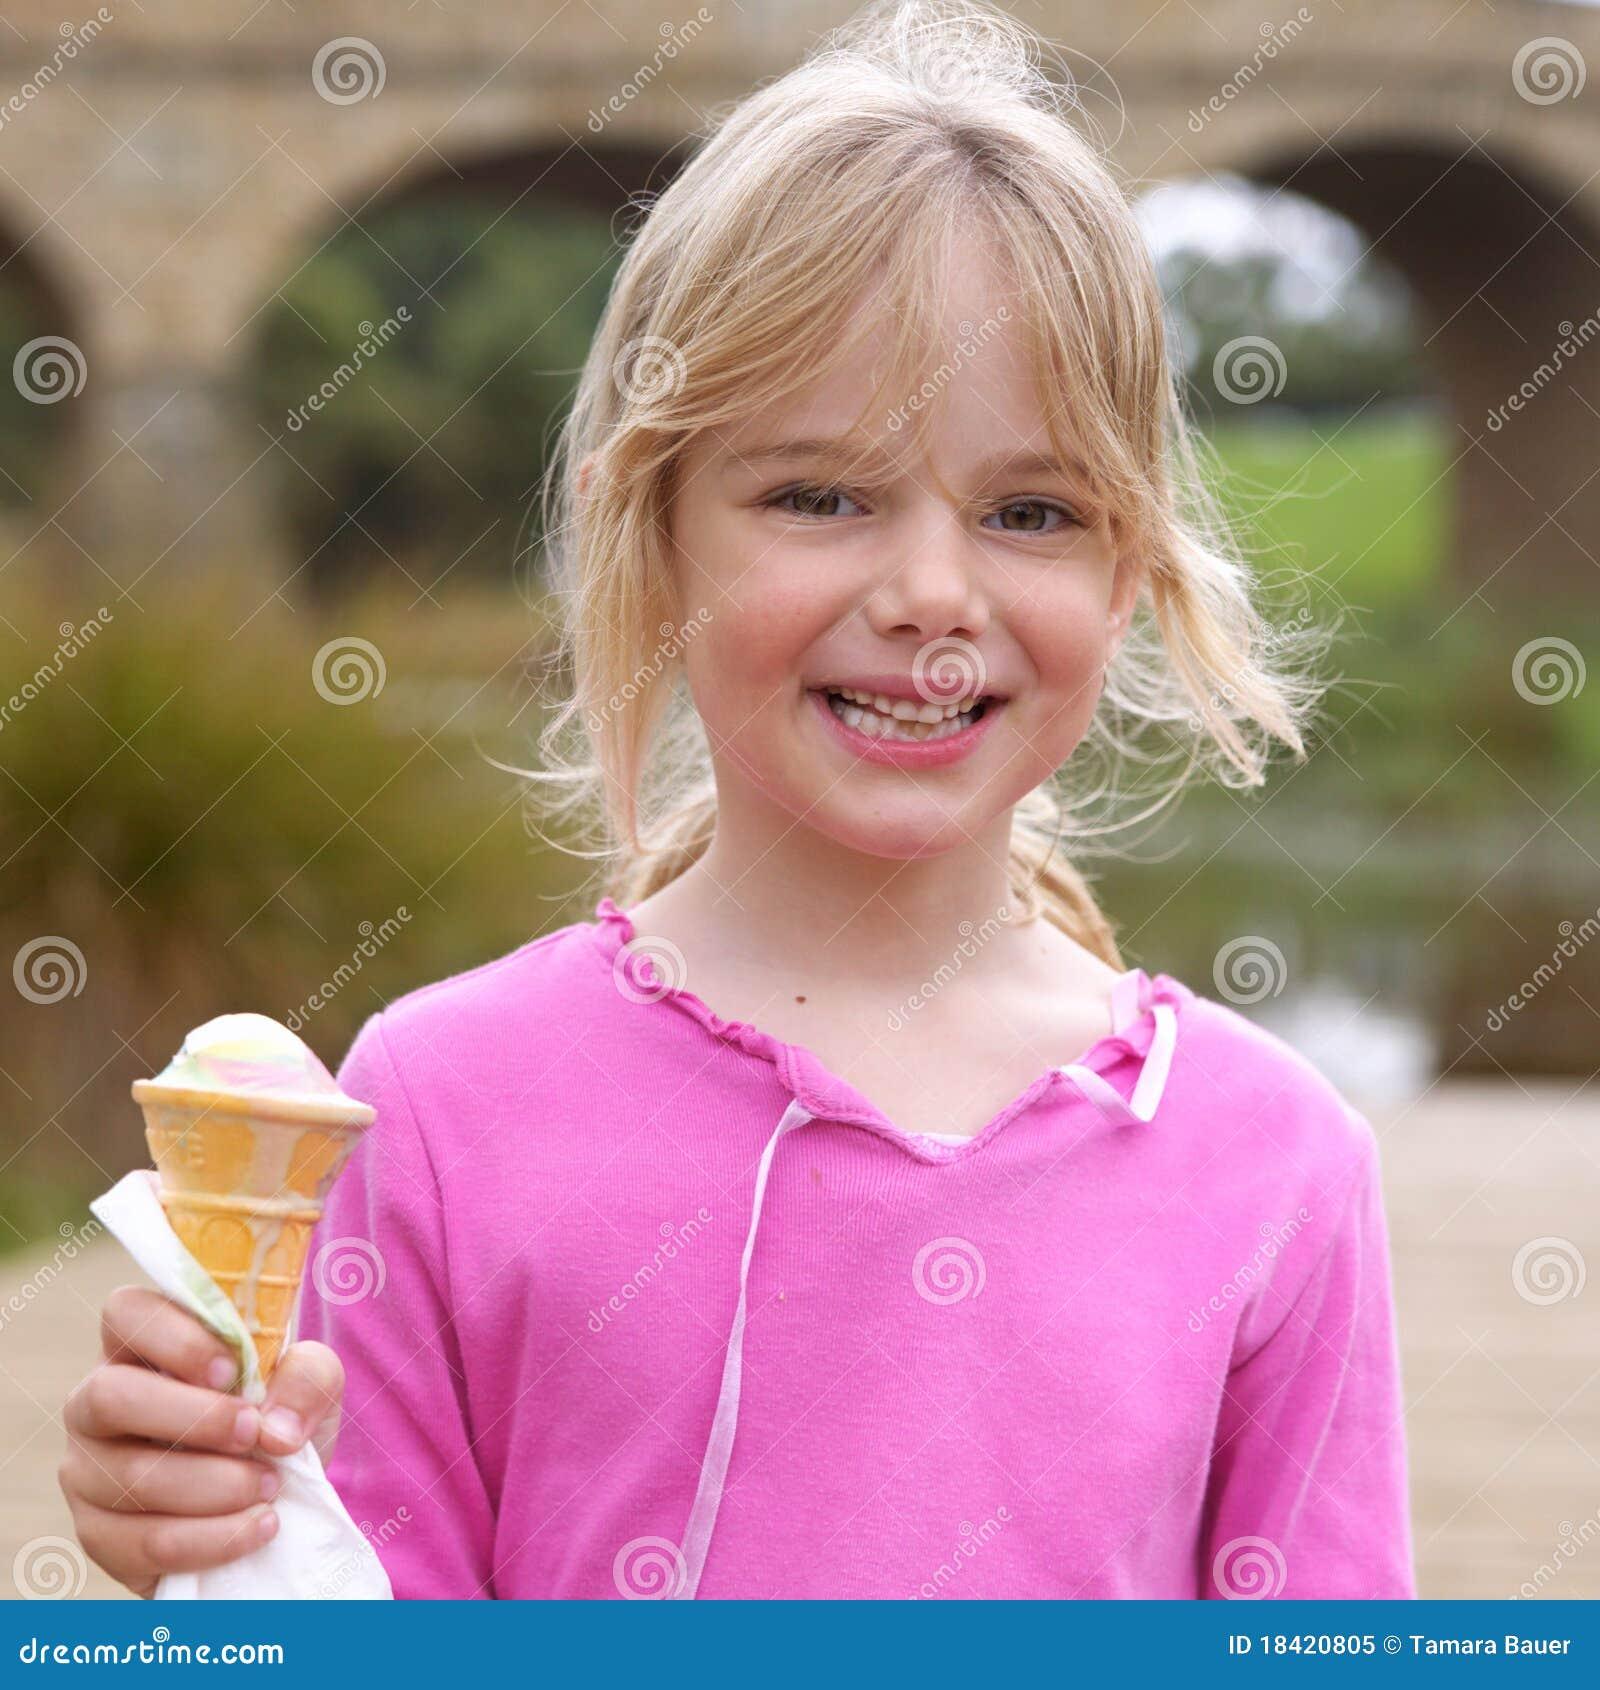 Ice Cream Royalty Free Stock Photo - Image: 18420805